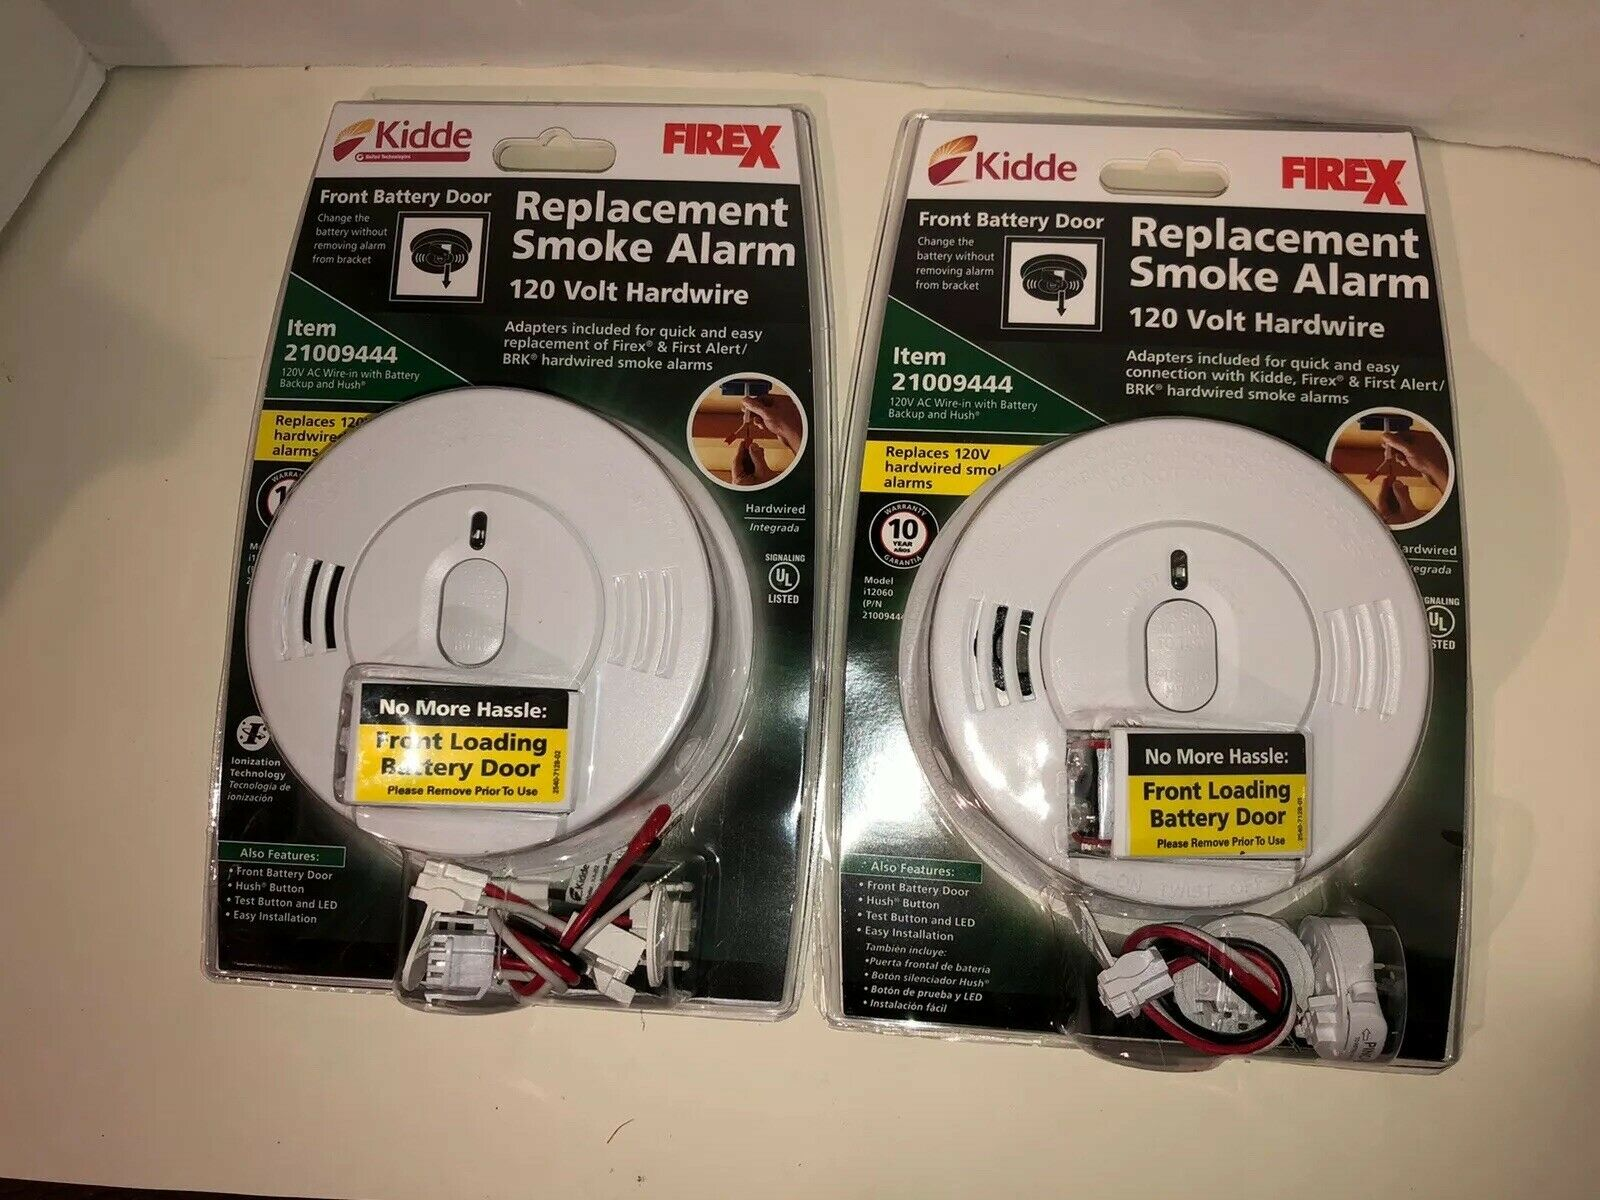 Lot Of 2 Kidde 21009444 Replacement Smoke Alarm 120 Volt Hardwire